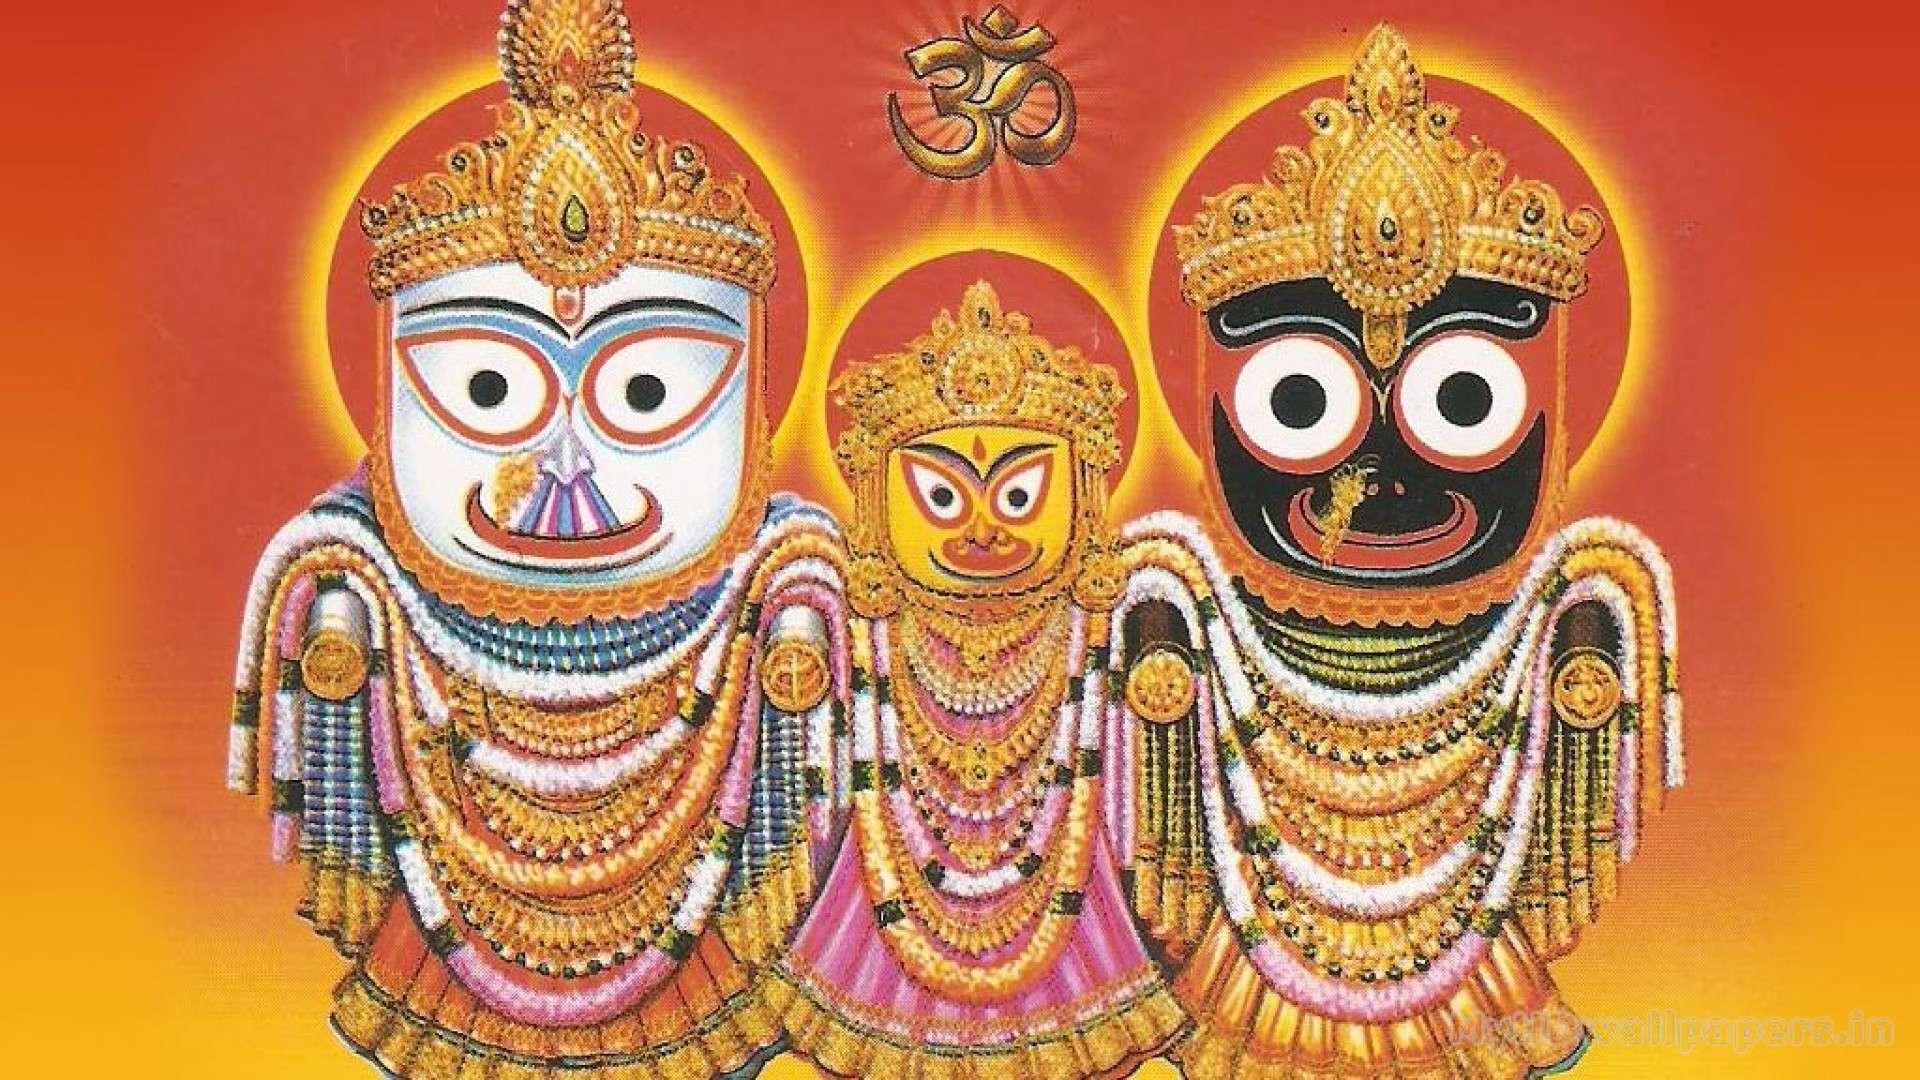 Hindu God Hd Wallpaper Desktop Hd Wallpapers 1920x1080